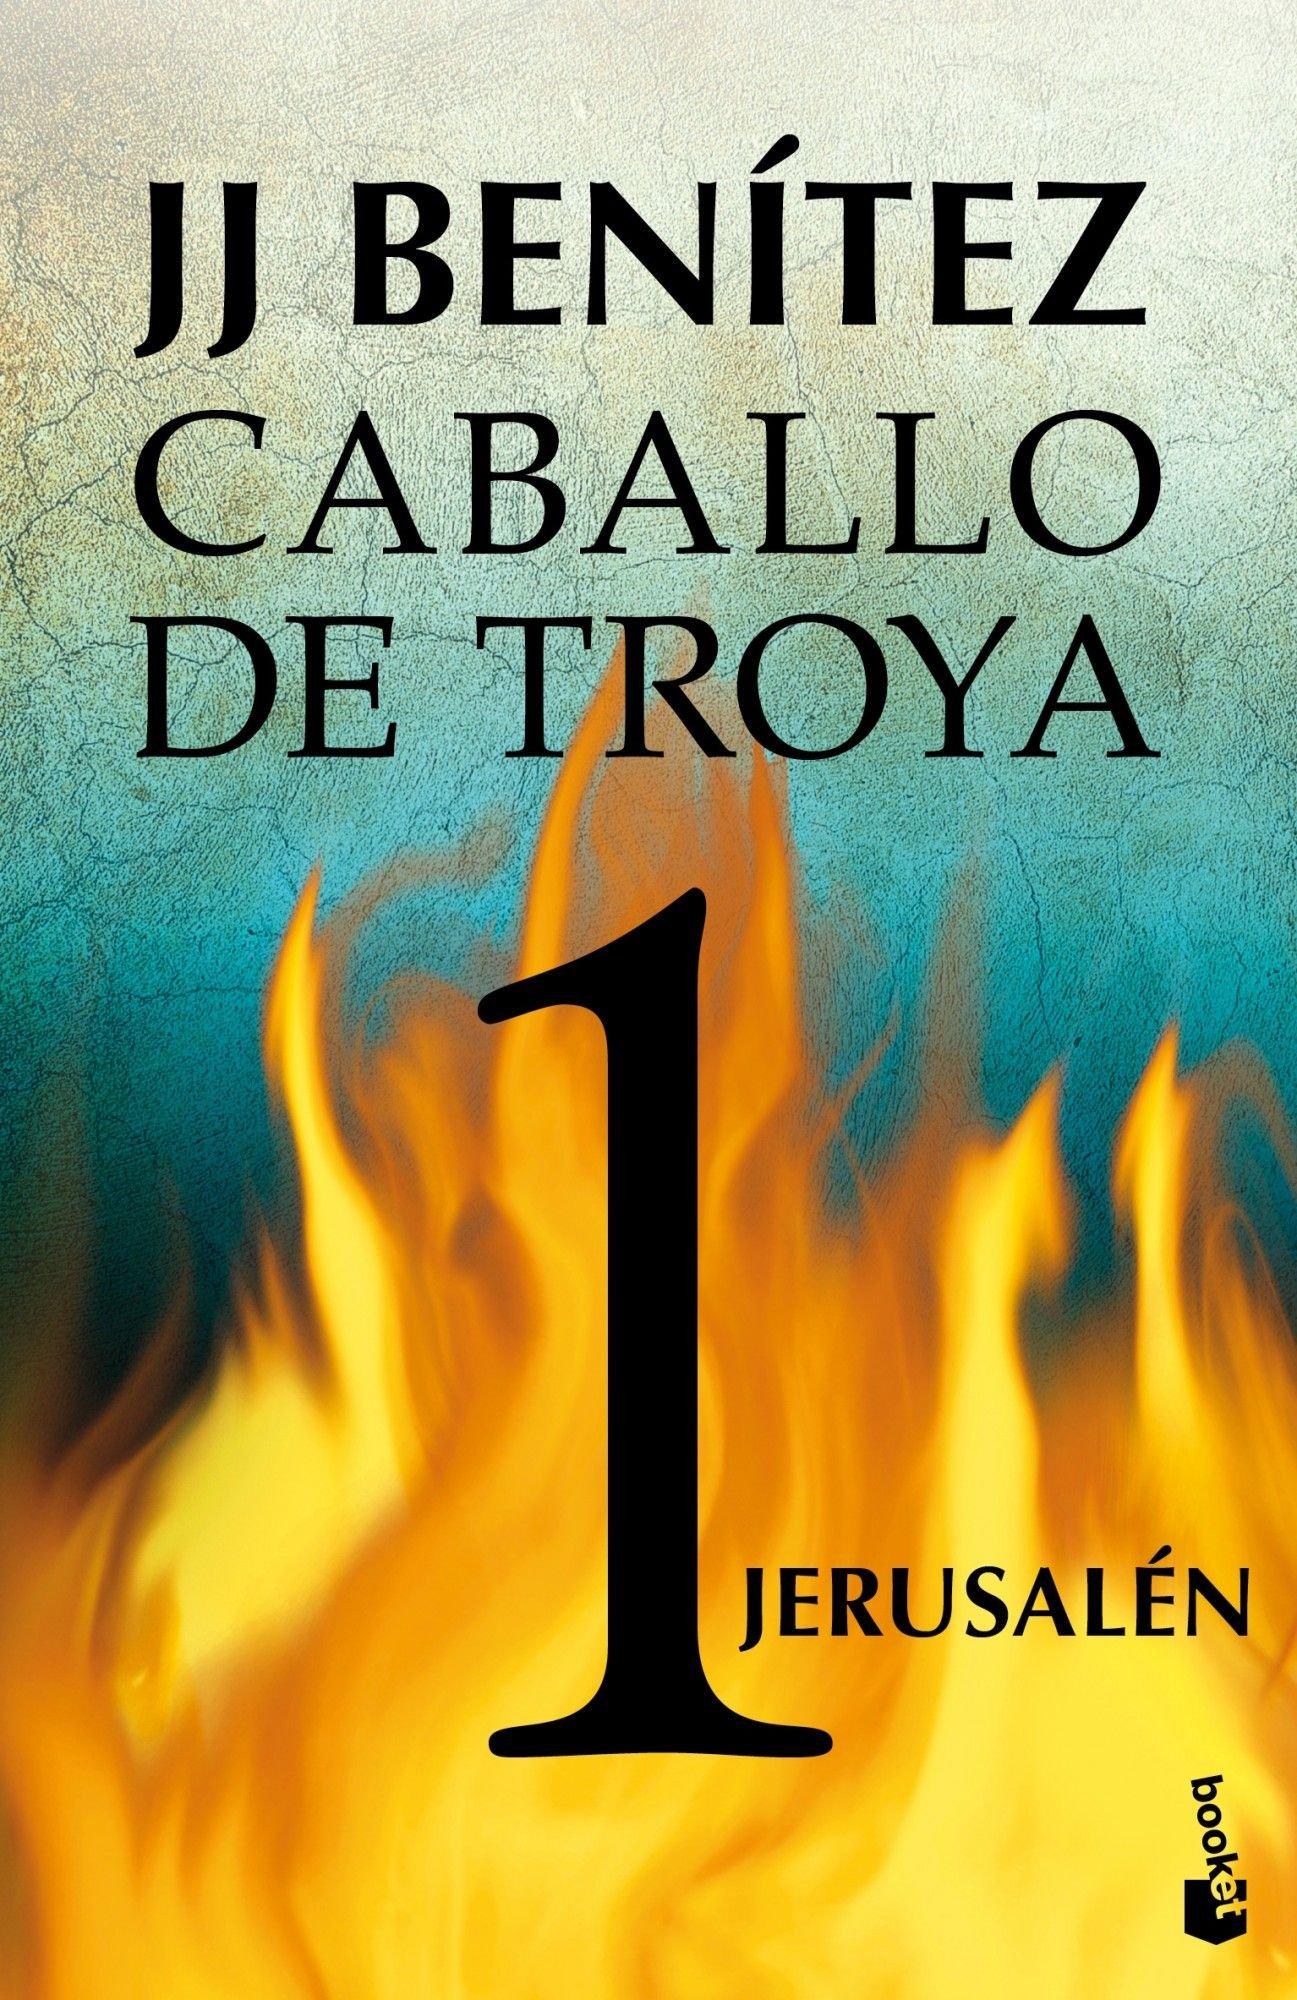 Jerusalén. Caballo de Troya 1 (Gran Formato) Tapa blanda – 10 ene 2013 J. J. Benítez Booket 8408042033 1002-WS1501-A03012-8408042033